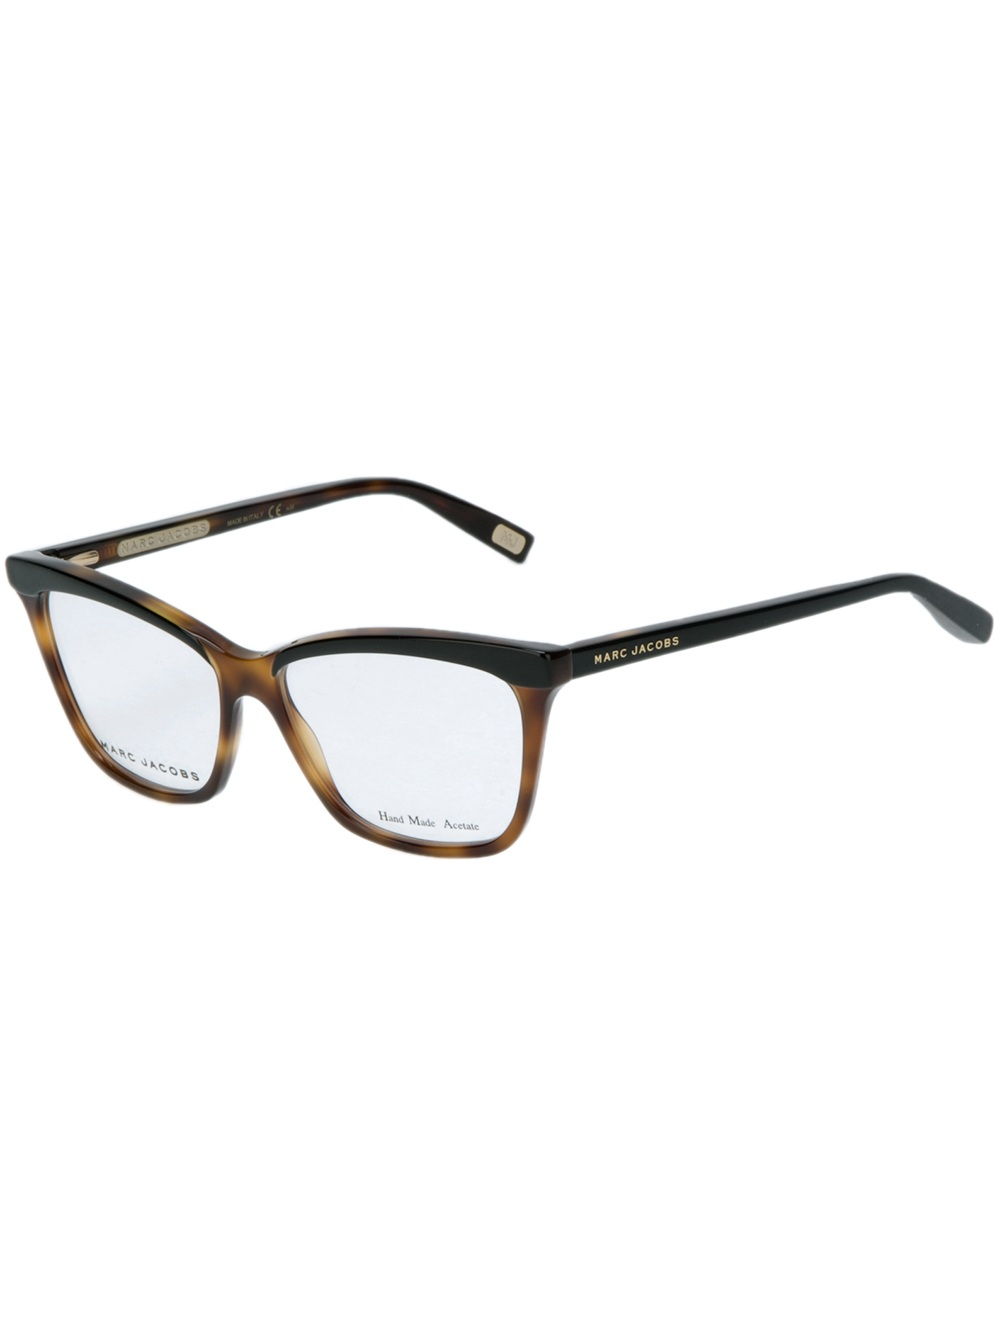 Marc Jacobs Sunglasses Women S  marc jacobs tortoise s wayfarer glasses in brown lyst